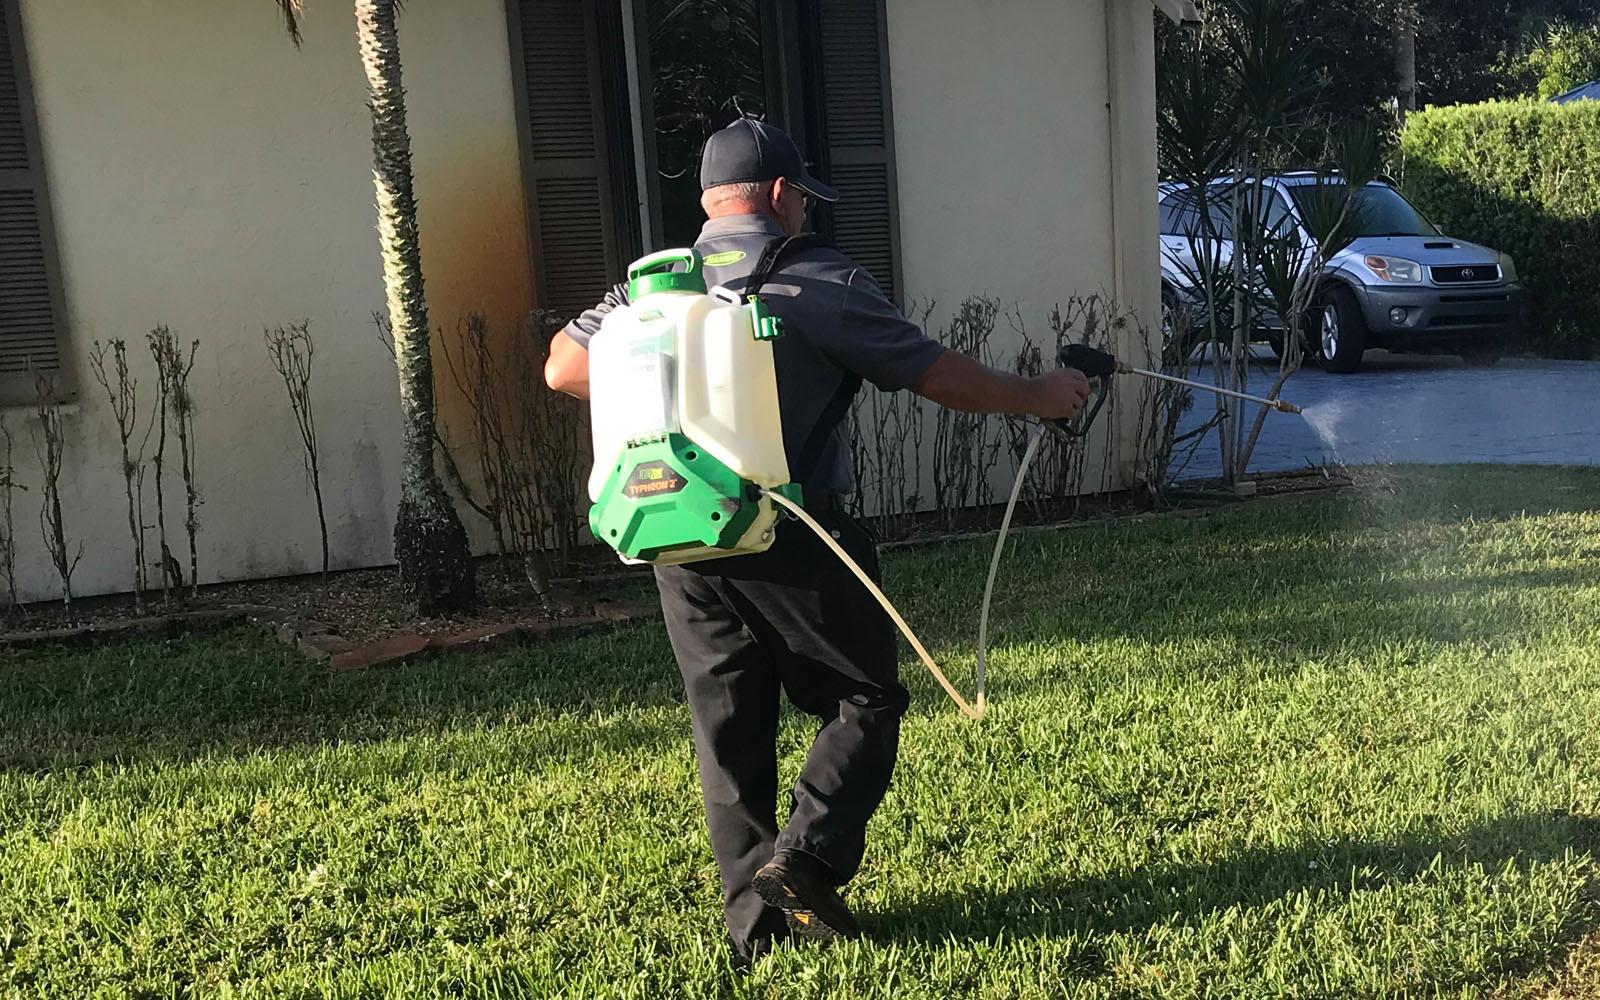 pest-control-tech-spraying